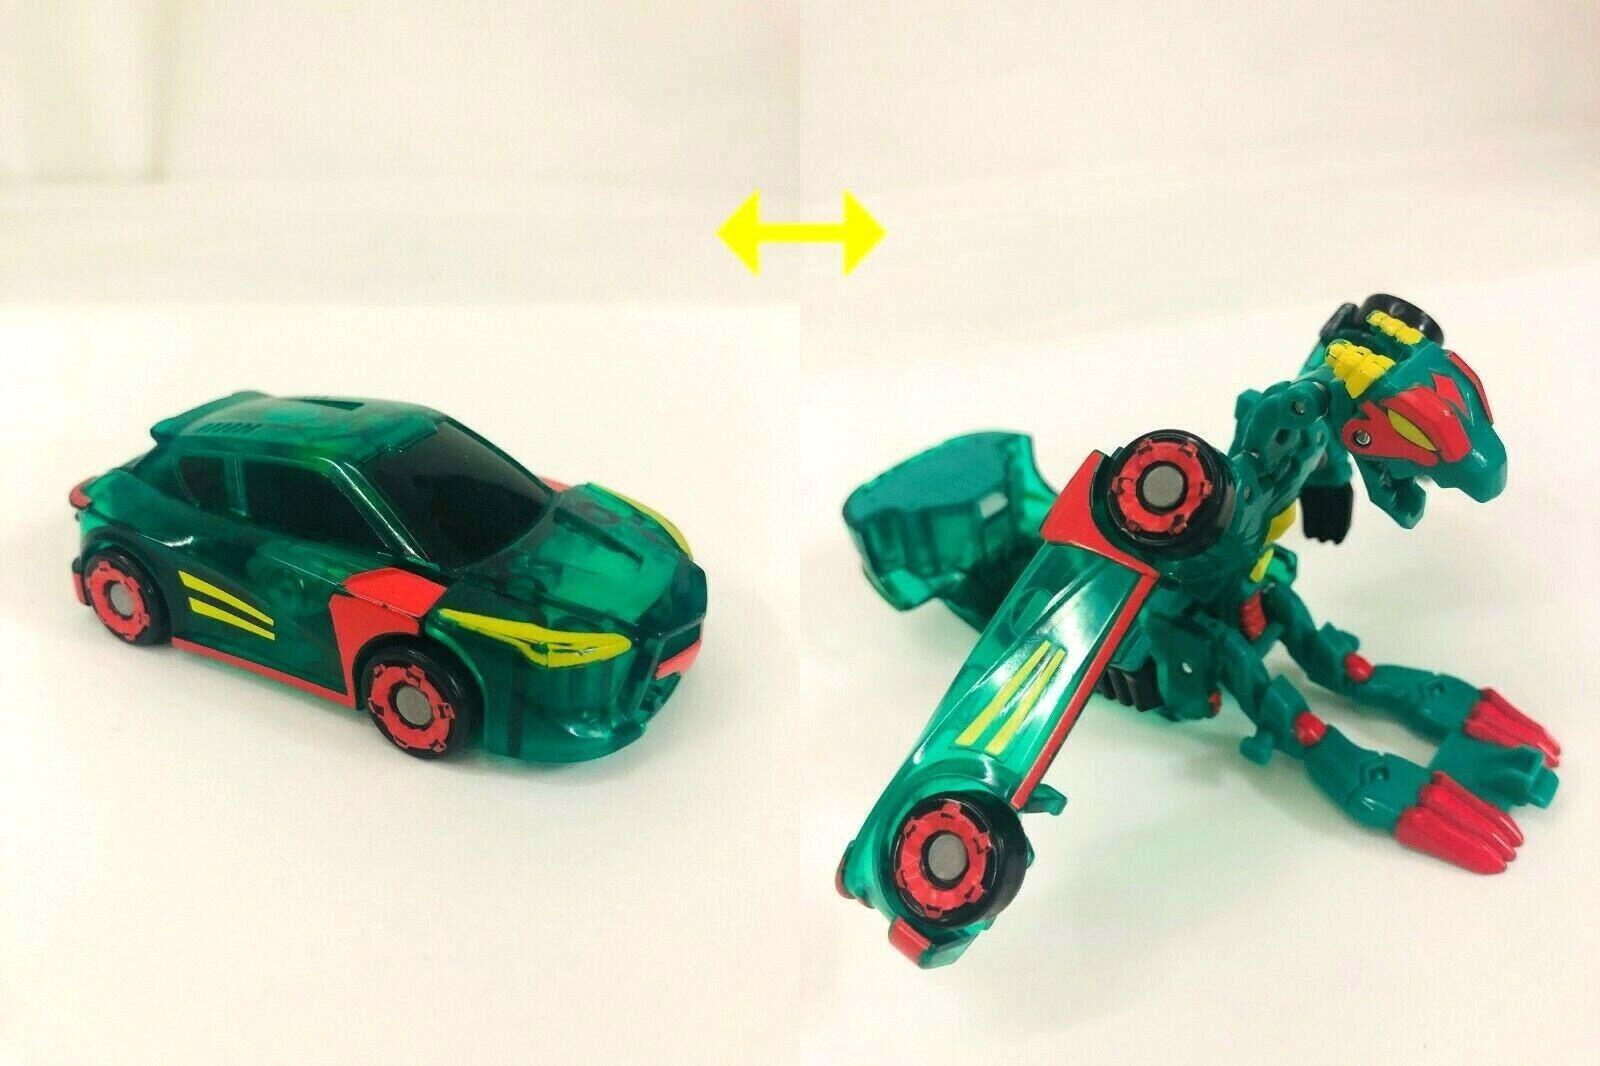 Transforming Robot To Toy Car Mecard Evan Deluxe